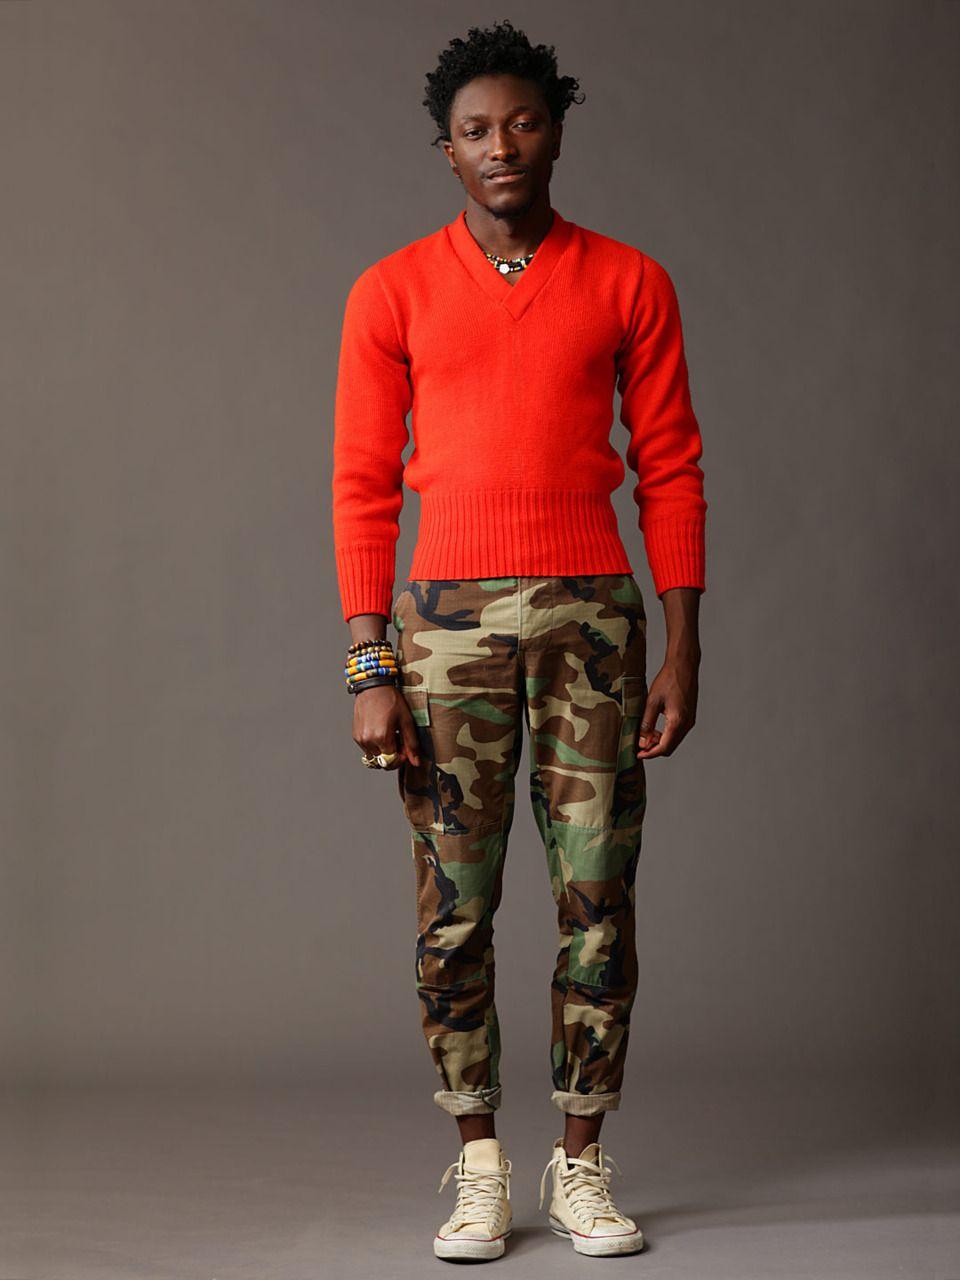 #orange & #camo || #menswear |Pinned from PinTo for iPad|